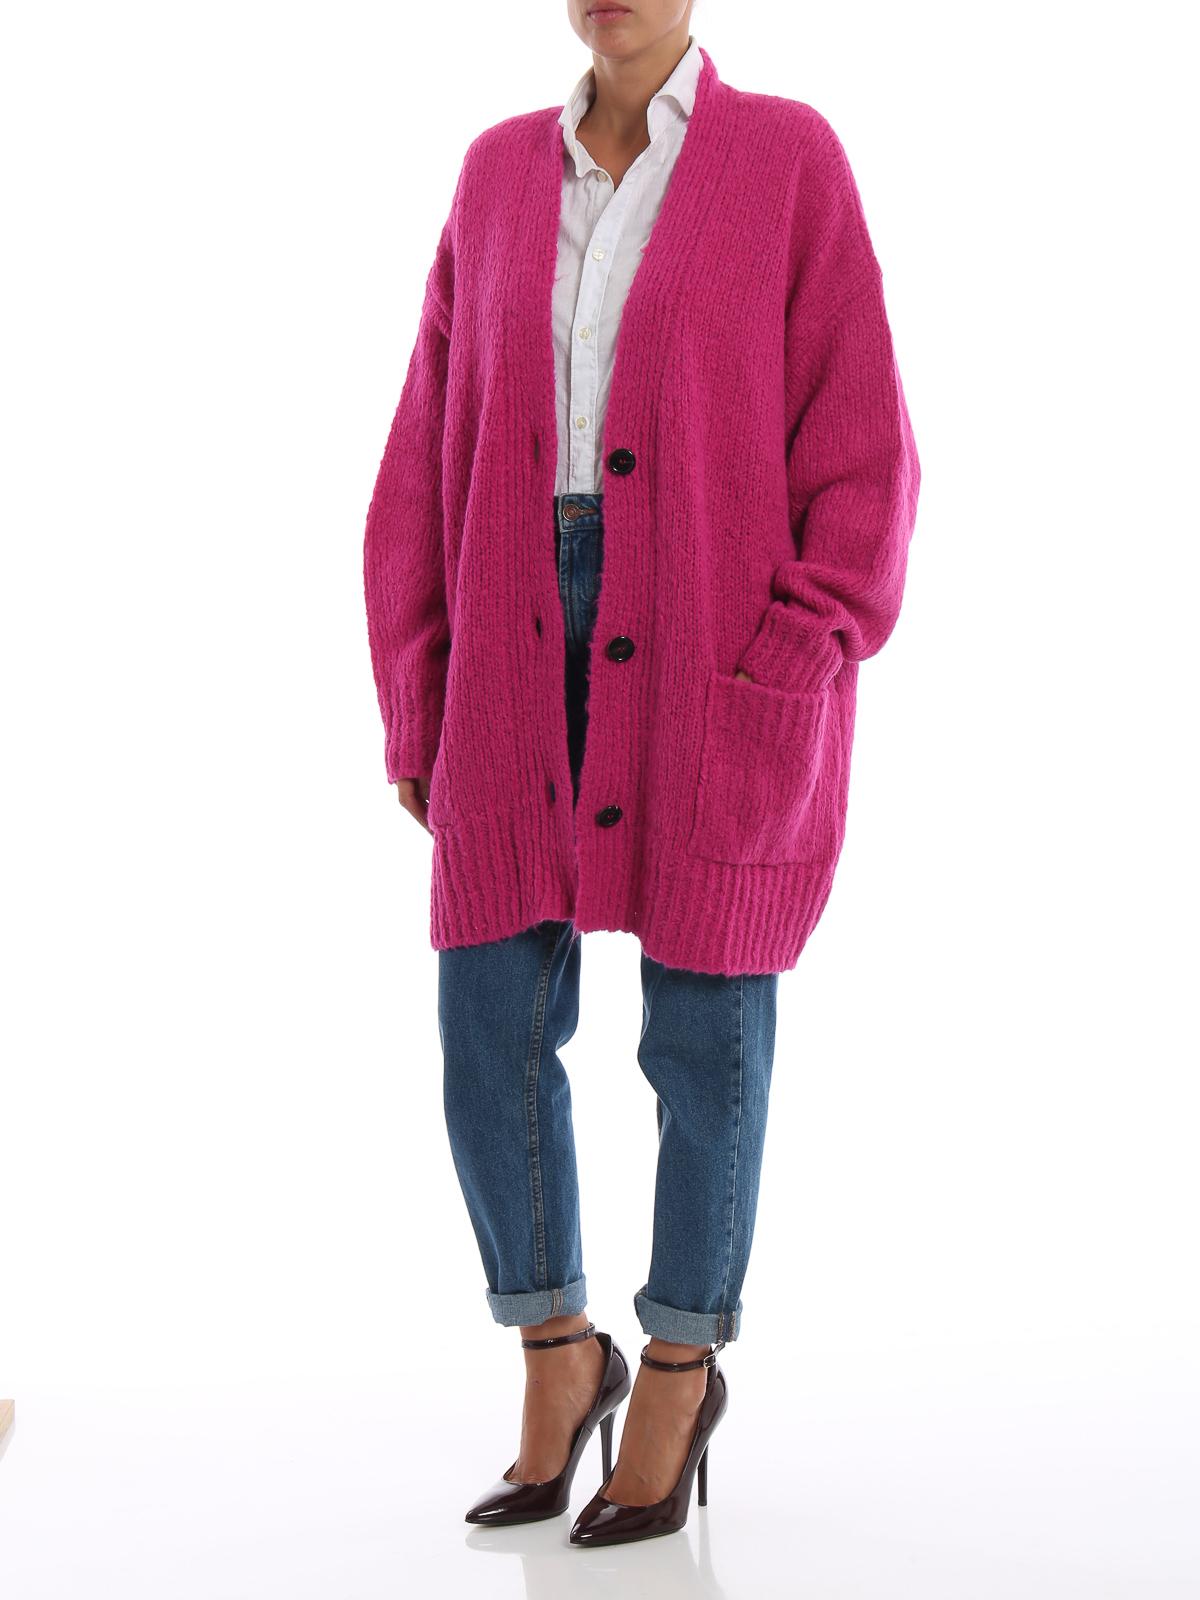 Isabel Marant Etoile  cardigans online - Sadlery pink drop alpaca blend  long cardigan 2e047cf13